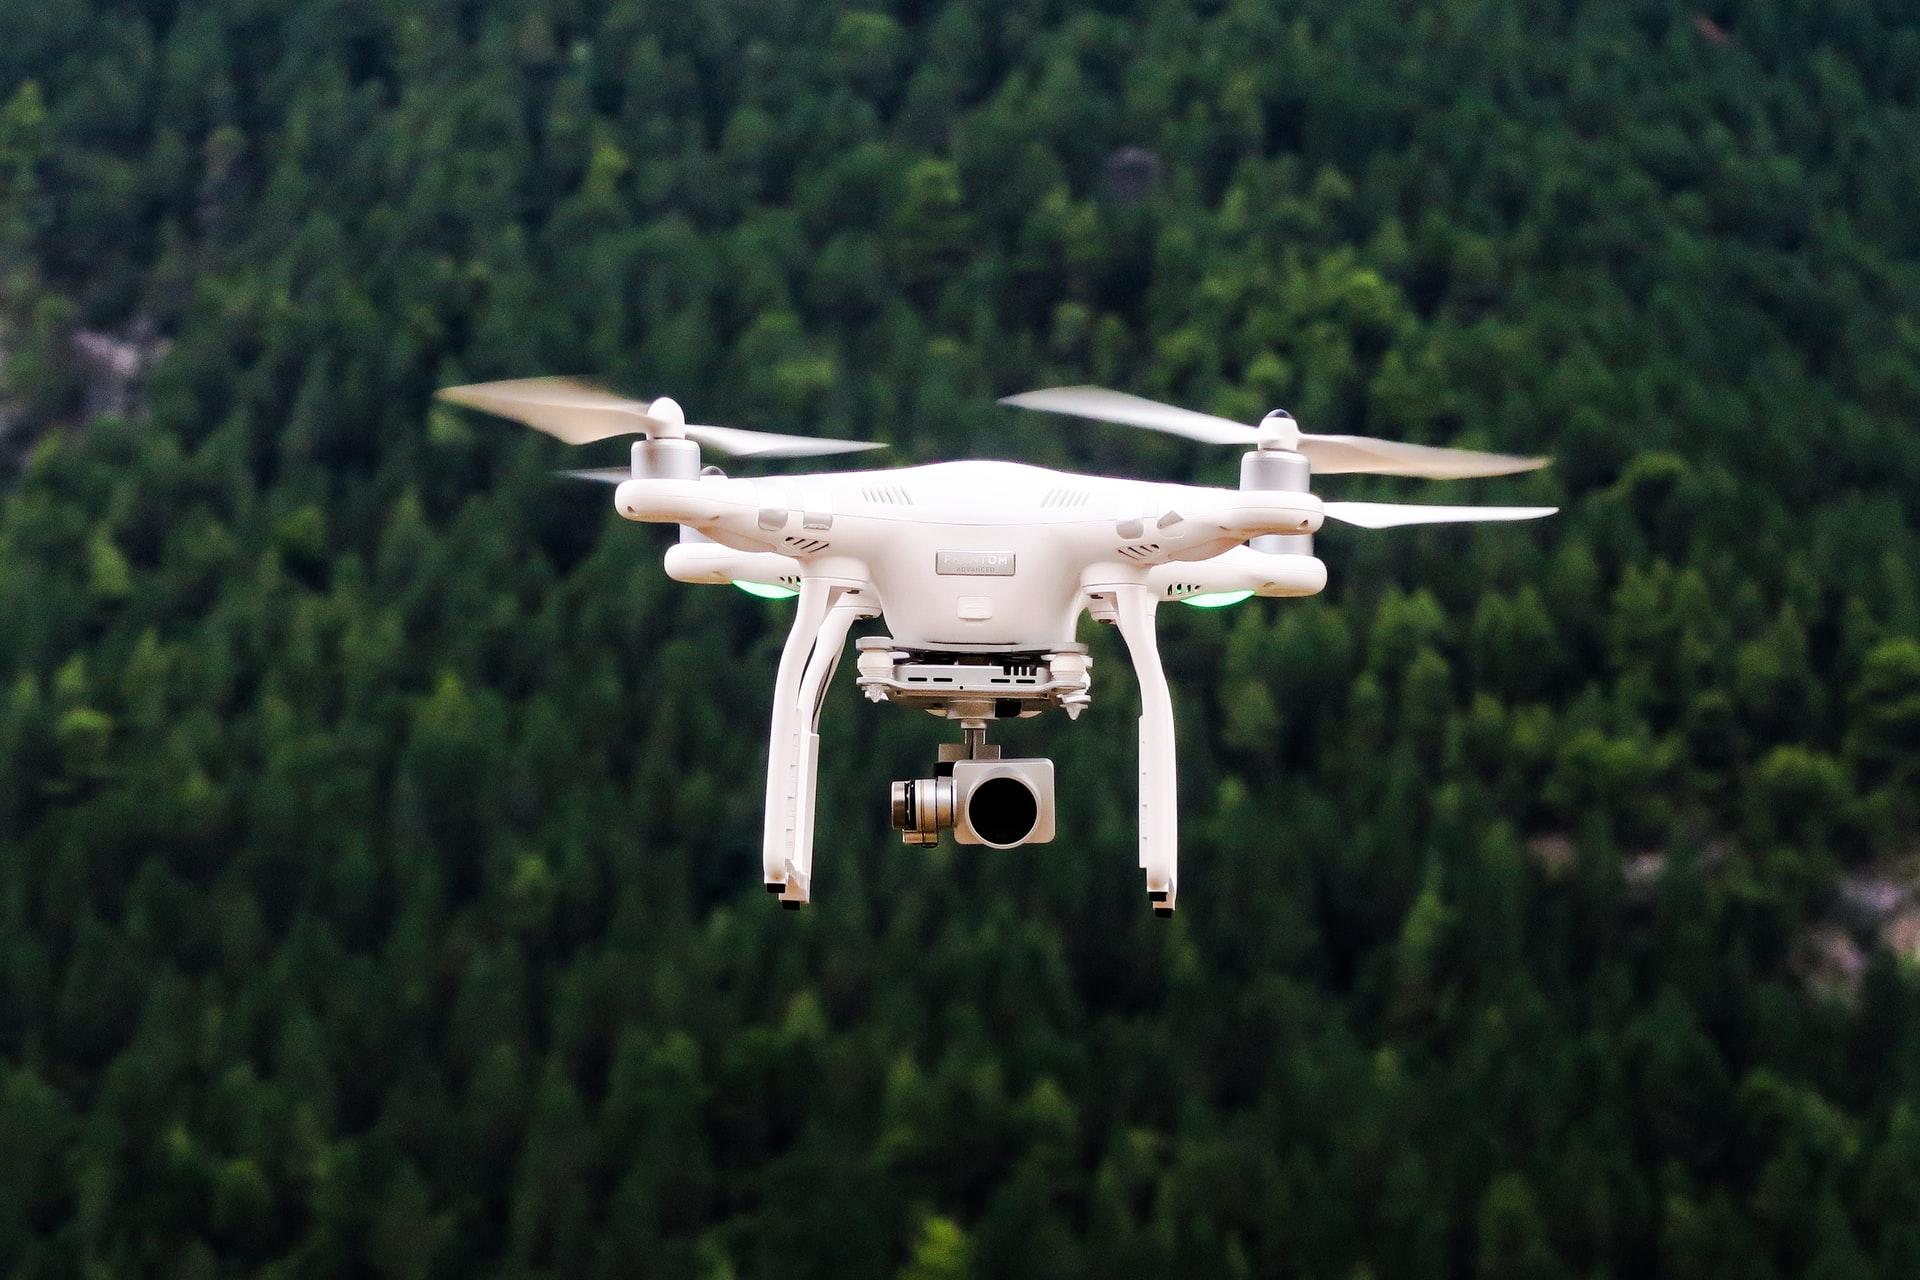 drone usage